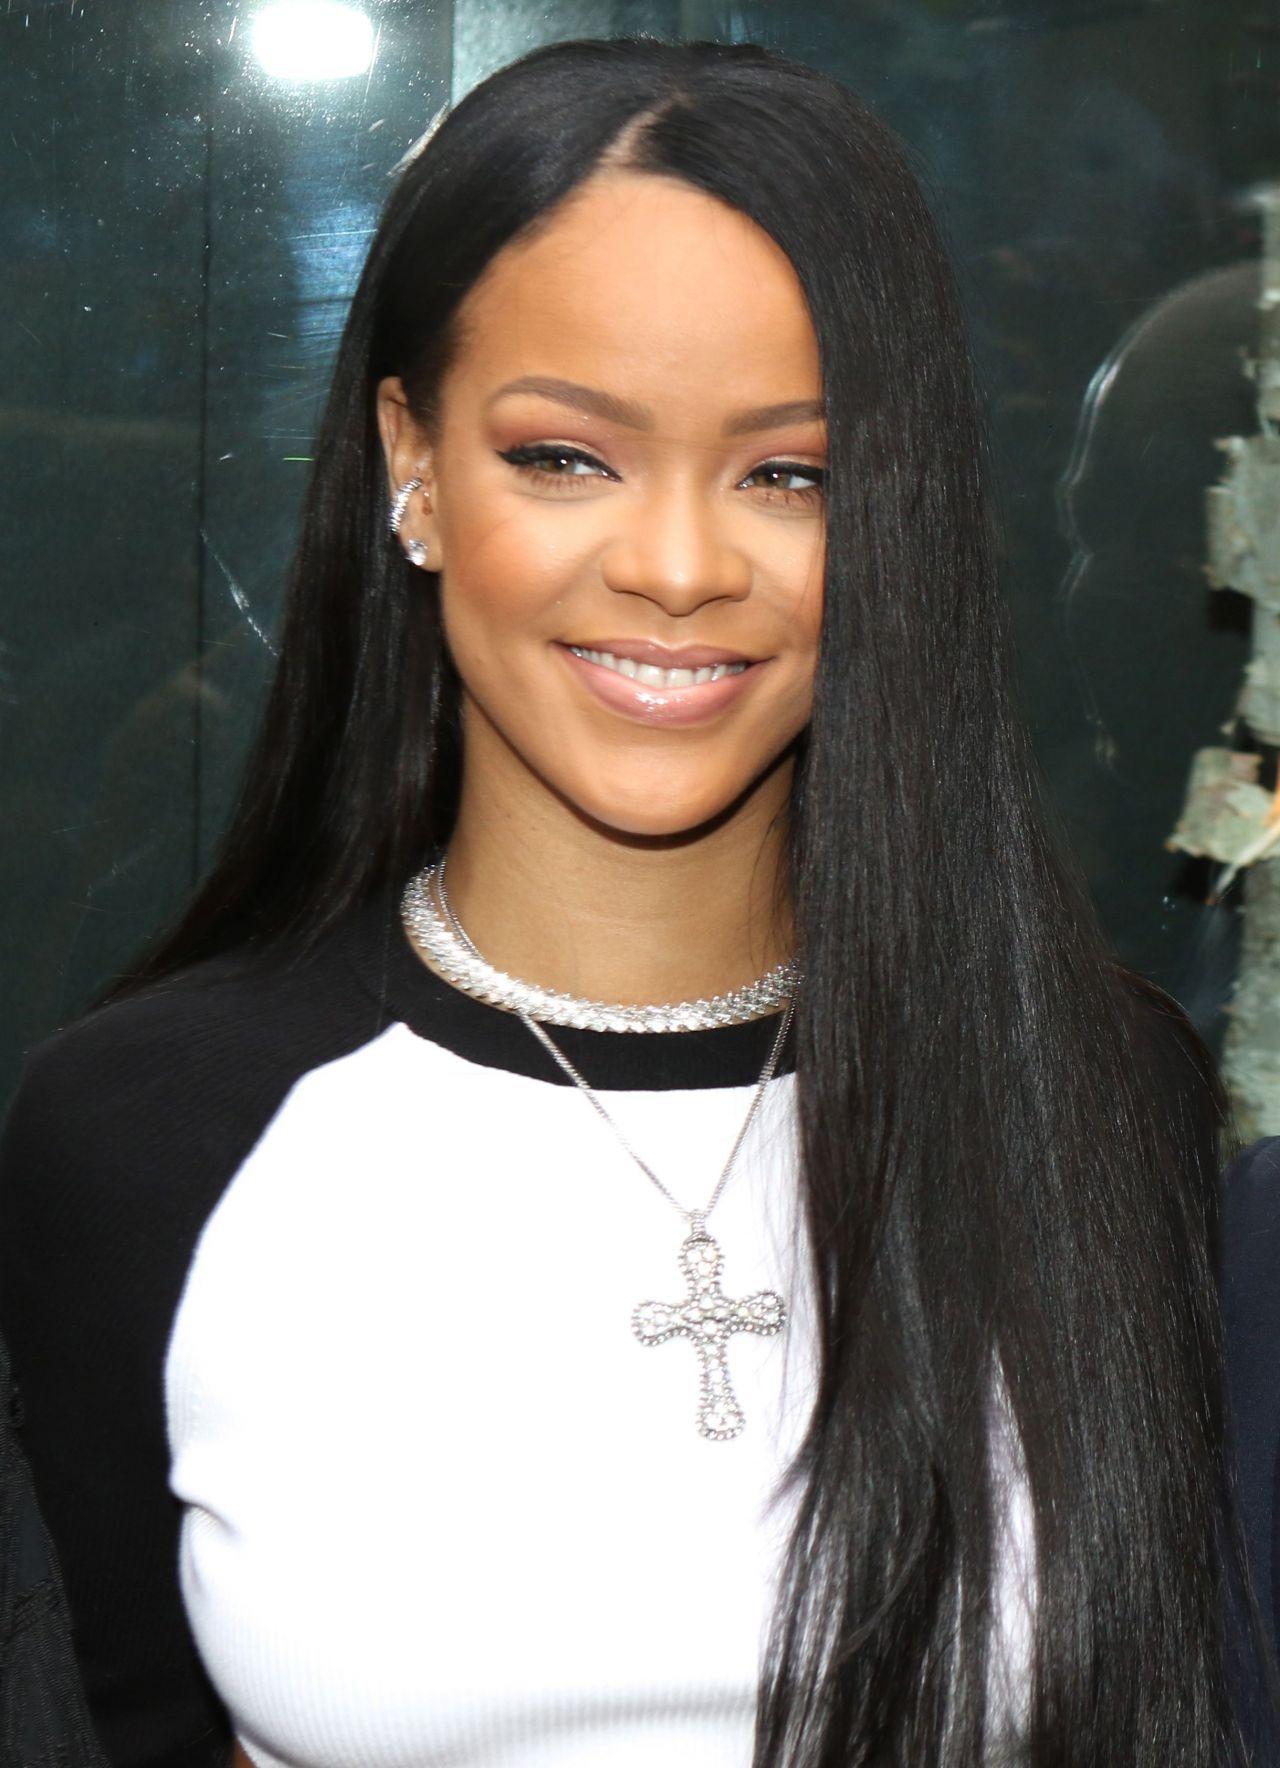 Rihanna Arrives For Fenty Puma X Rihanna Debut In Nyc 9 6 2016